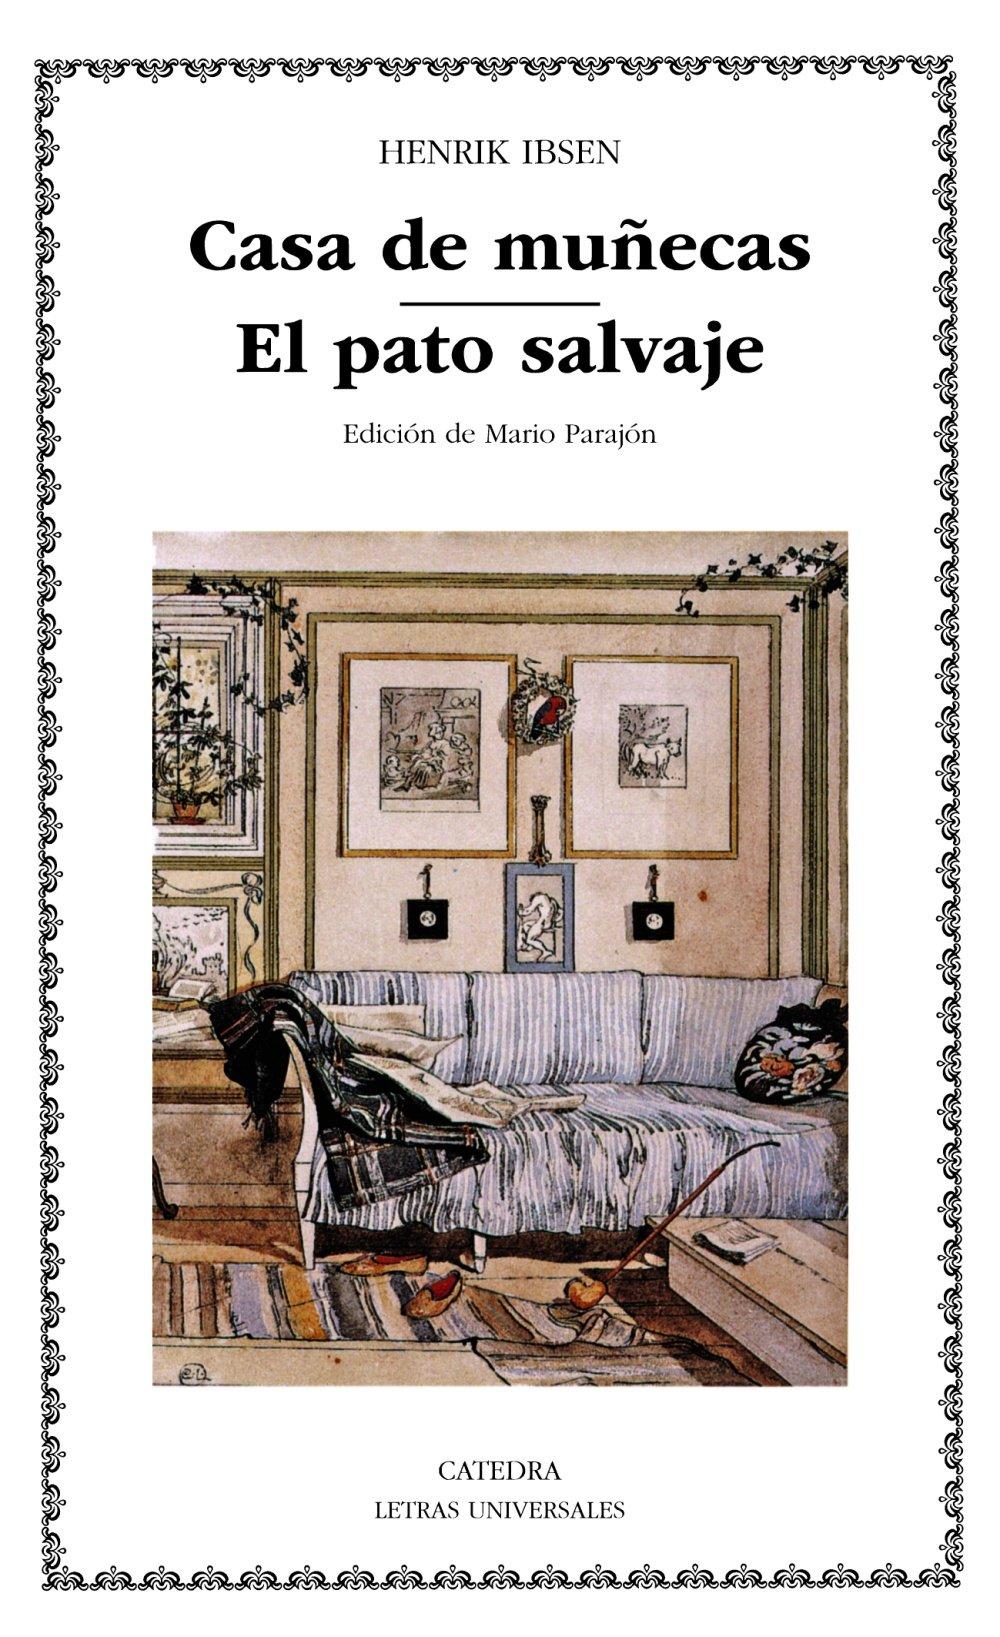 Casa de munecas s house the wild duck letras universales spanish edition spanish paperback june 30 2004